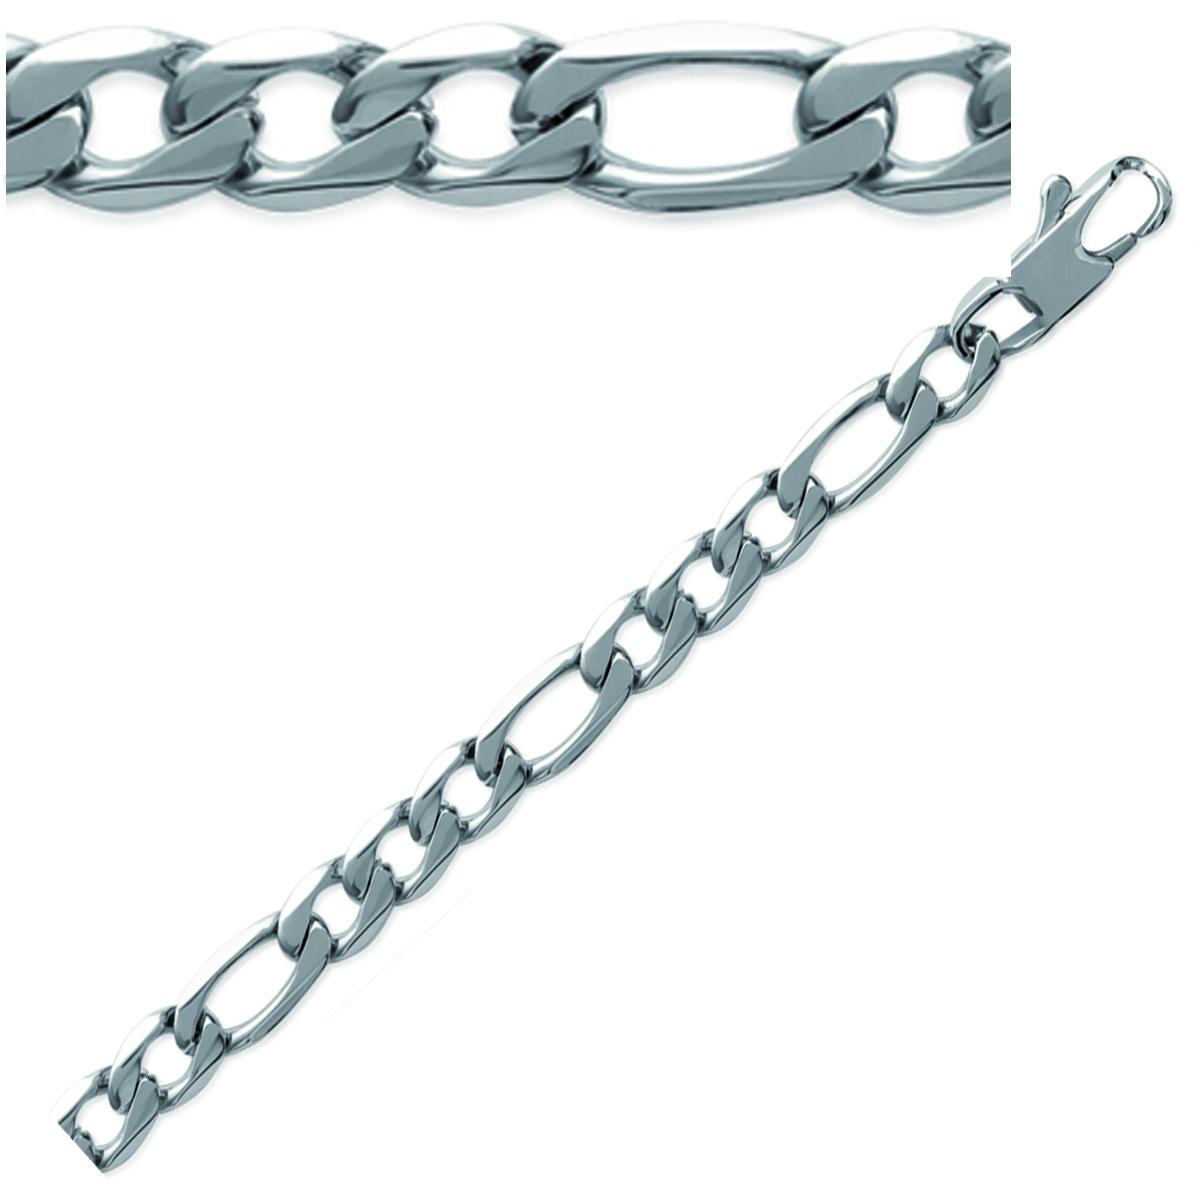 Bracelet Acier \'Maille Figaro\' argenté - 21 cm 6 mm - [K9364]